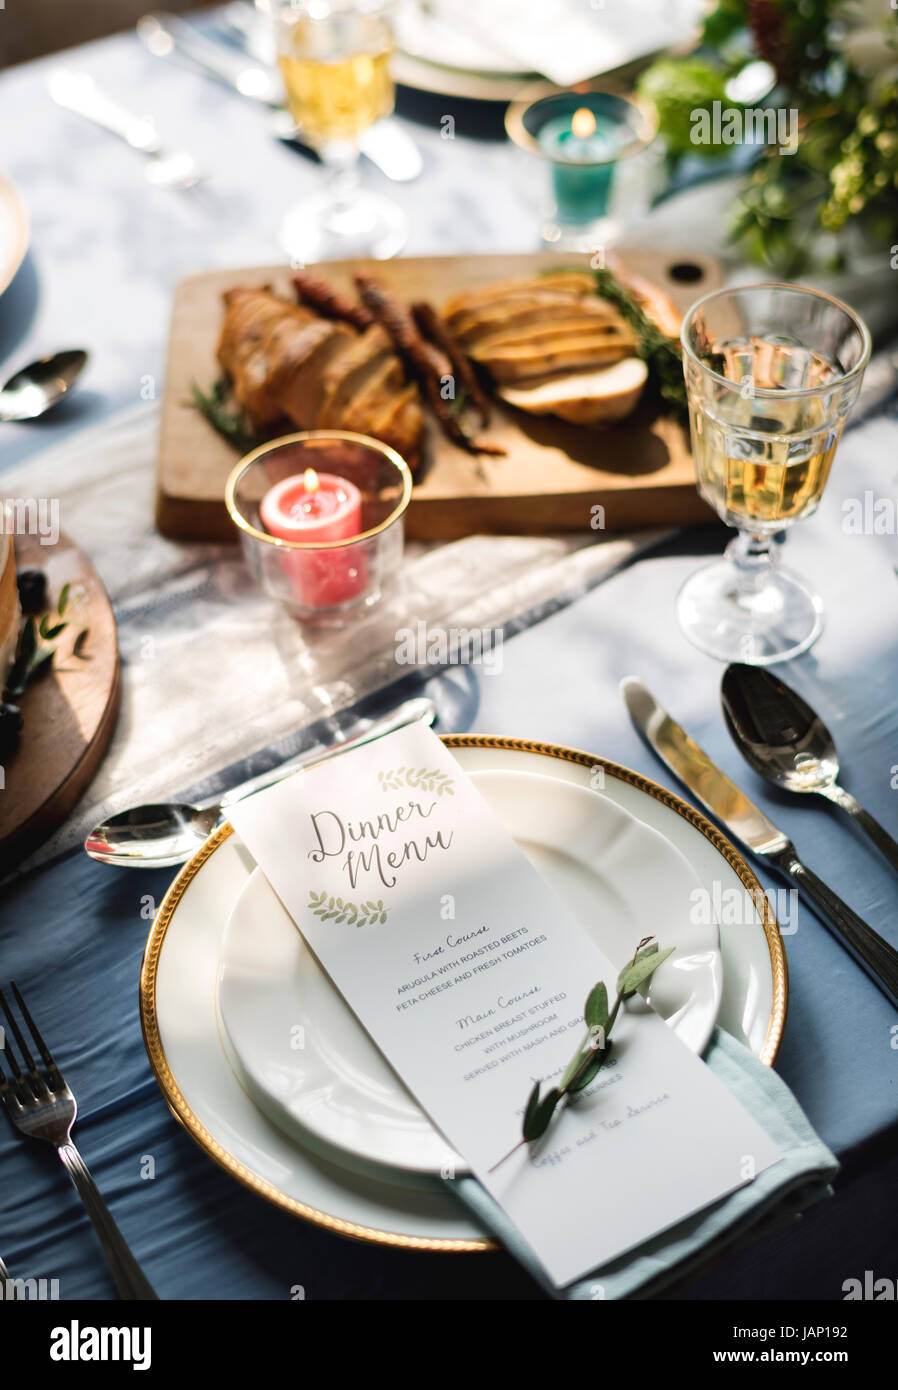 Dinner Menu on Plates Table Setting - Stock Image